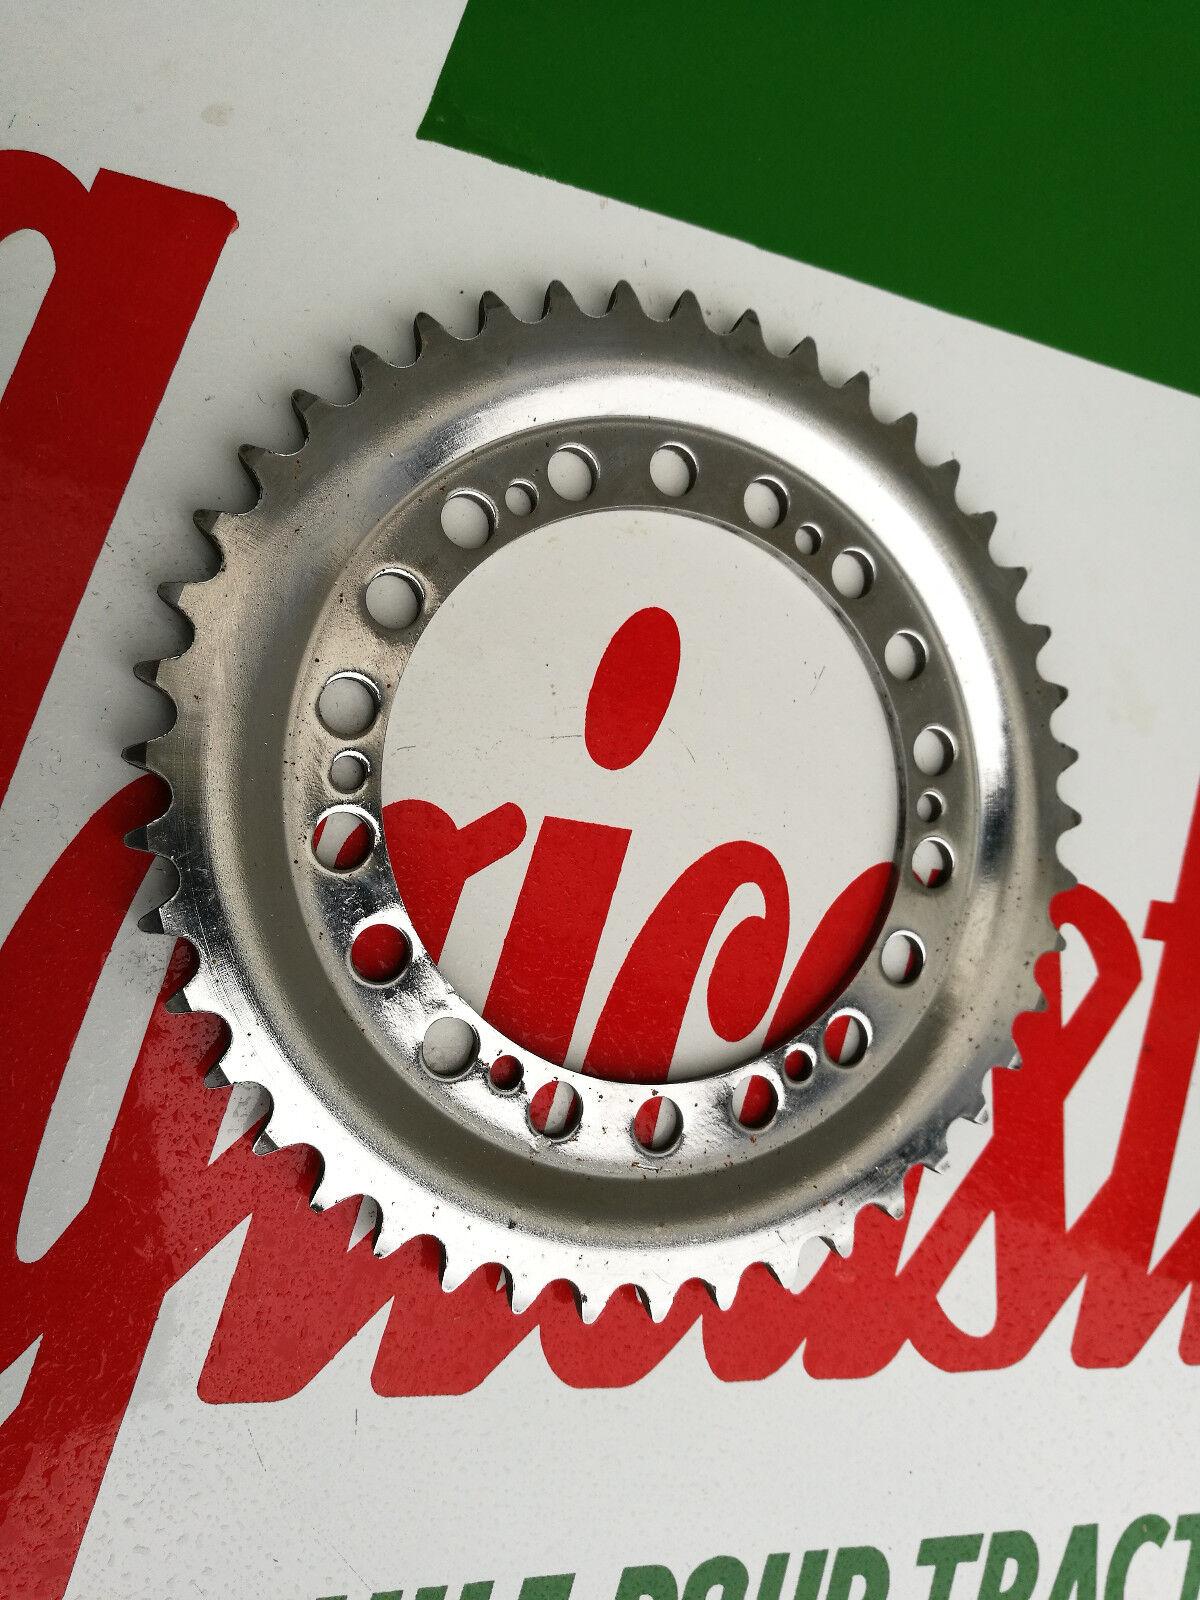 N.O.S couronne pignon 44 DTS MOBYLETTE MOTOBECANE MOTOCONFORT PEUGEOT